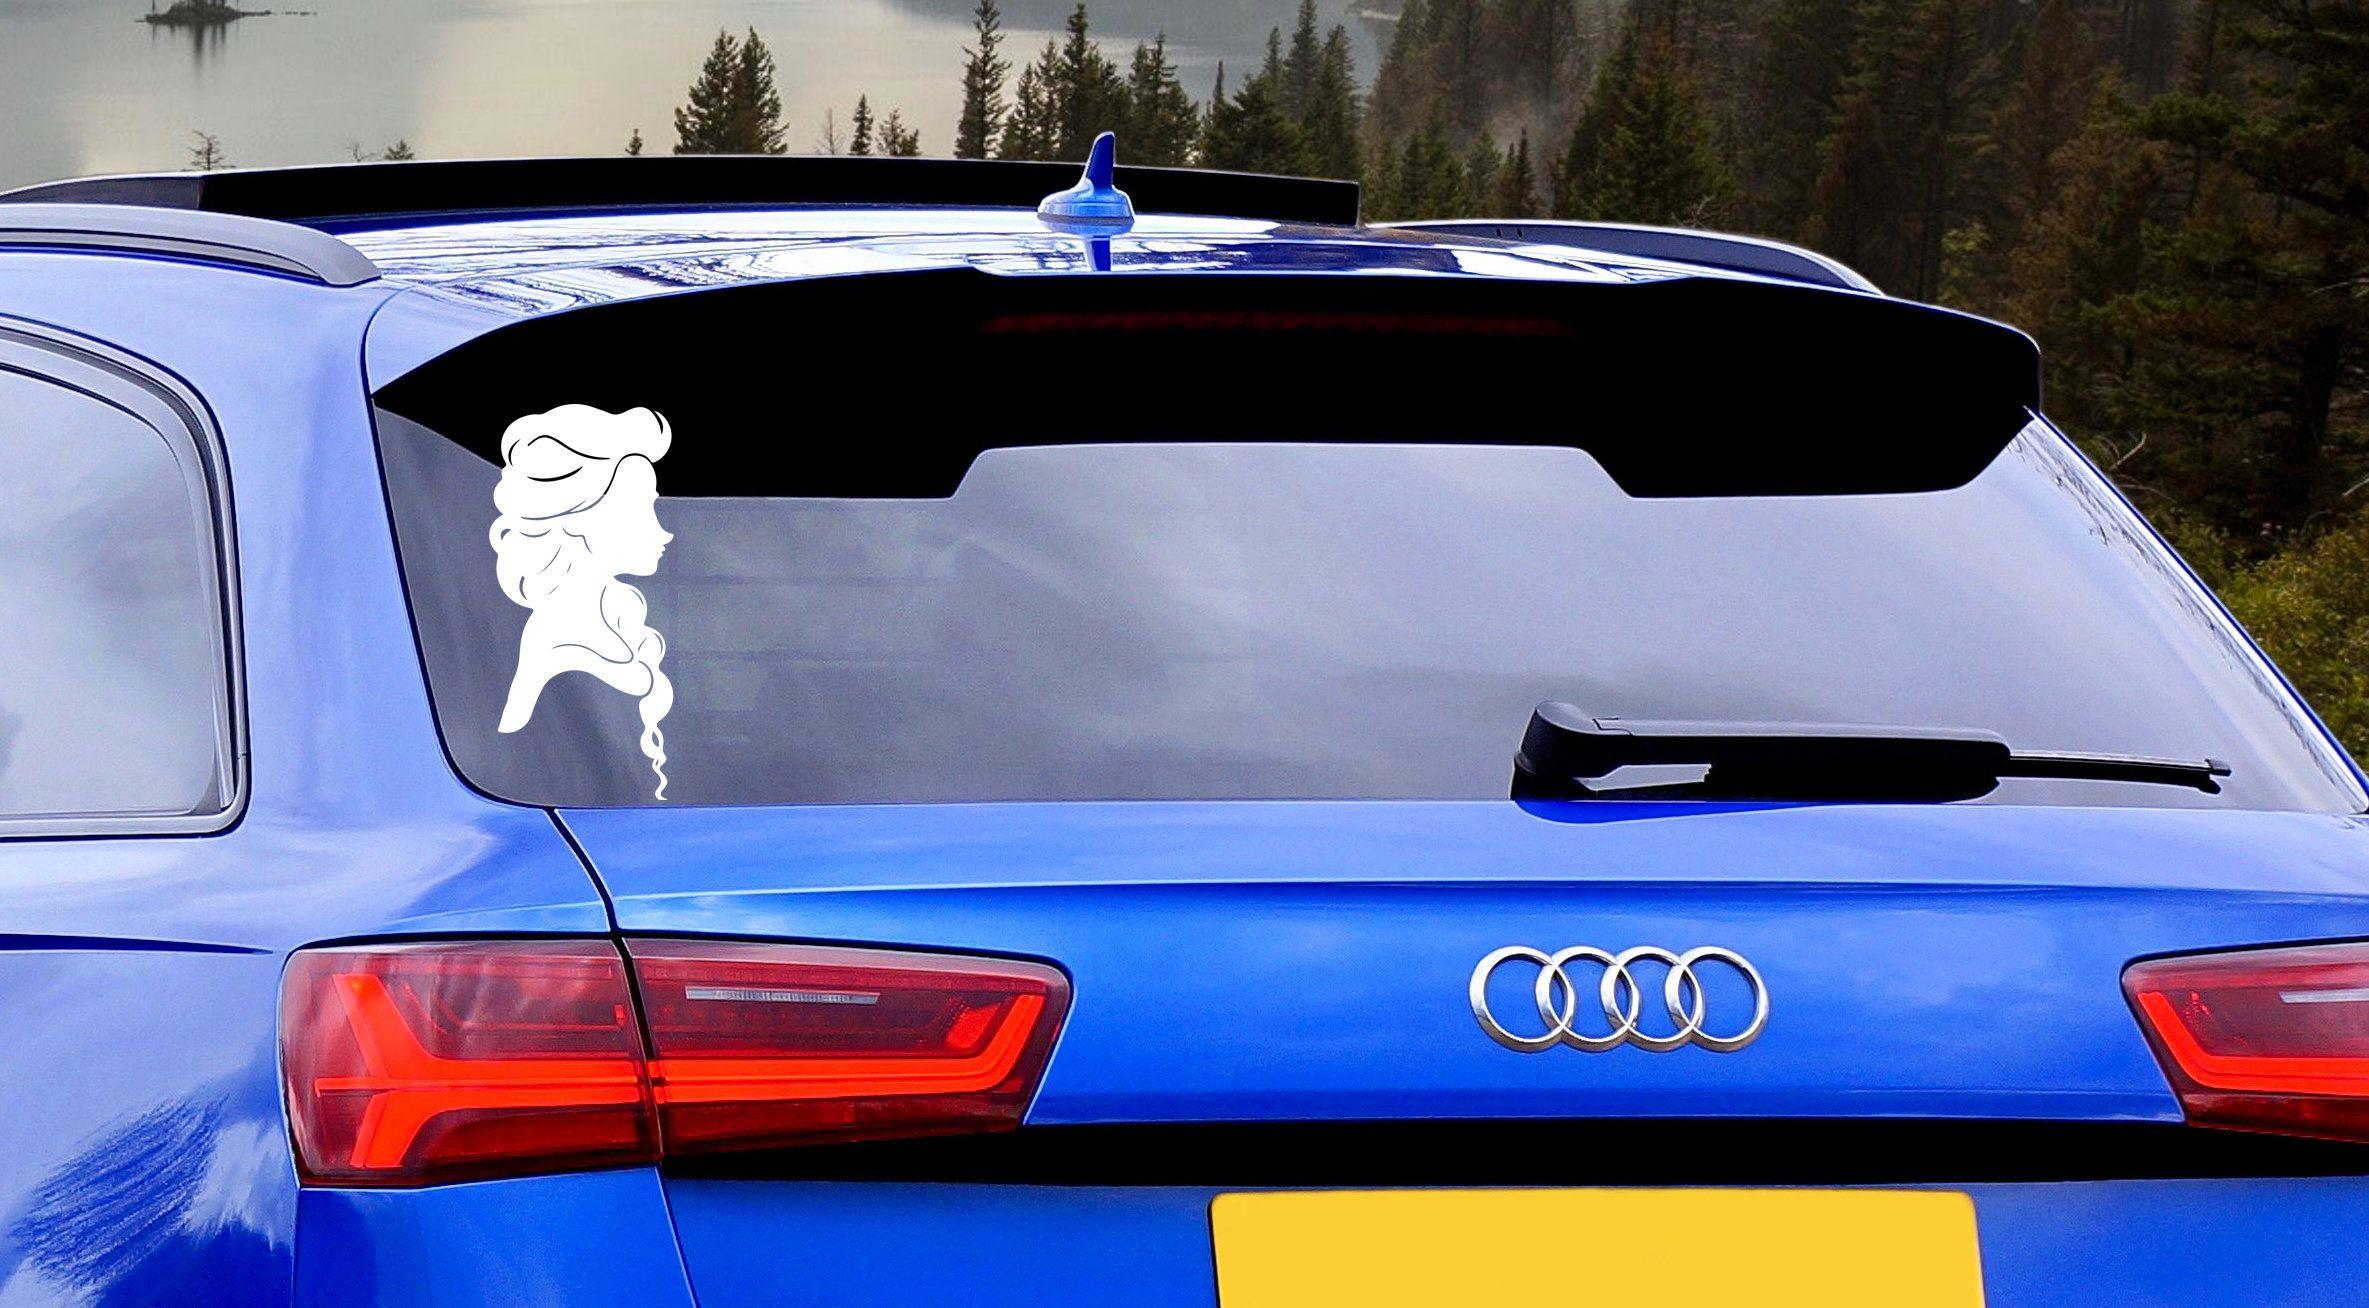 Elsa Inspired Car Decal Frozen Car Window Sticker Car Decal Stickers Window Decal Car Decals Car Decals Stickers Car Window Stickers [ 960 x 1280 Pixel ]